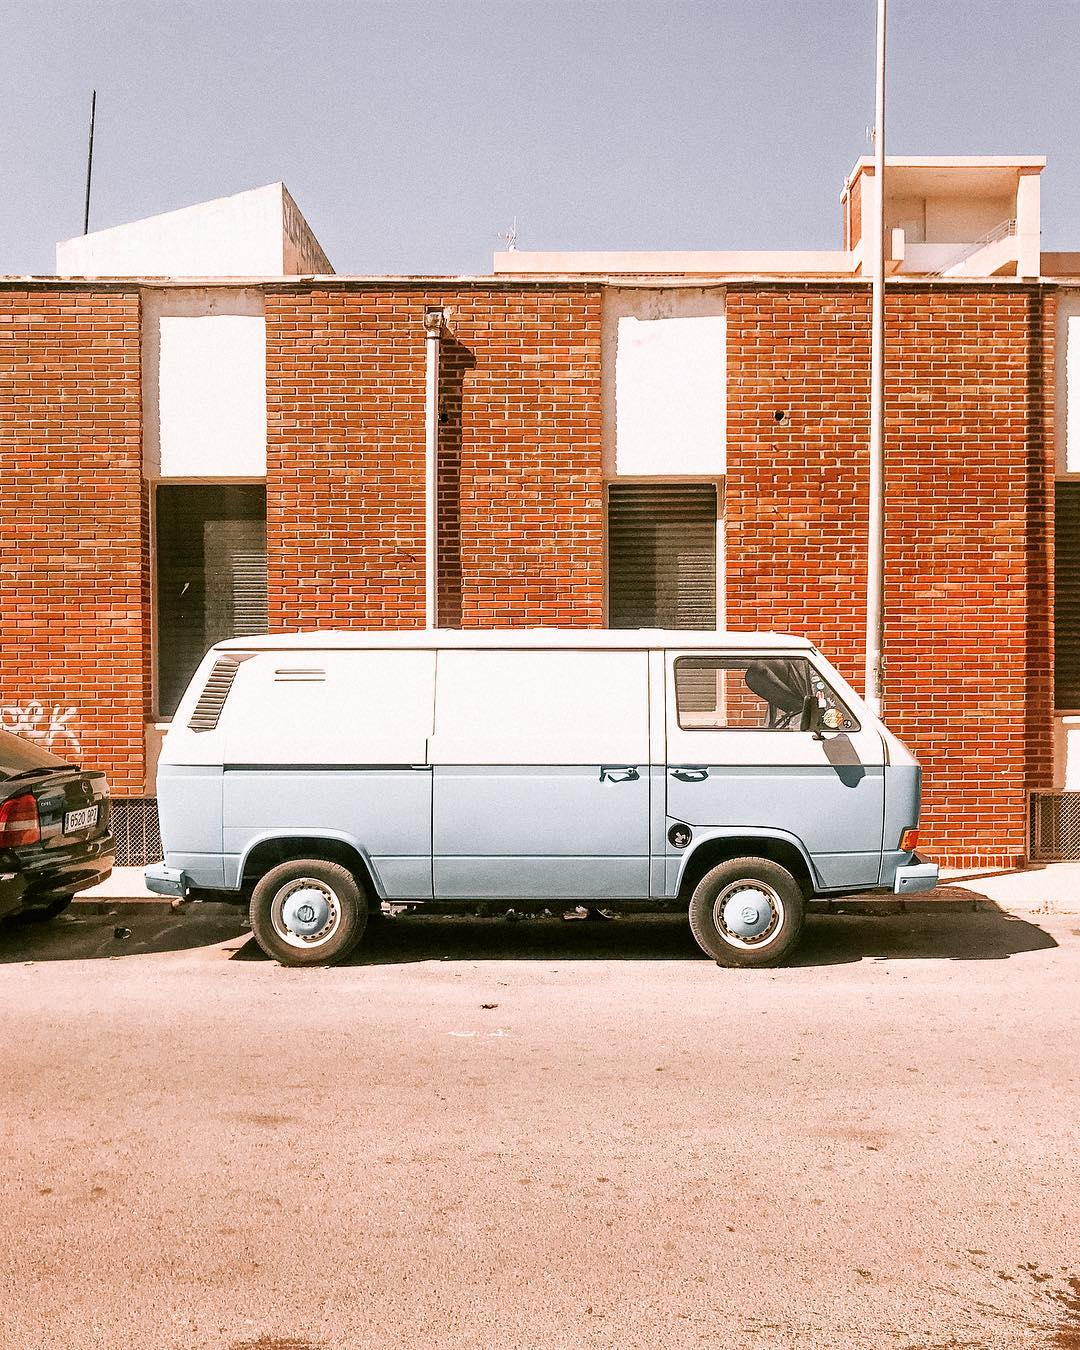 fotografo Joaquin Lucas paleta de colores de Wes Anderson  (60)